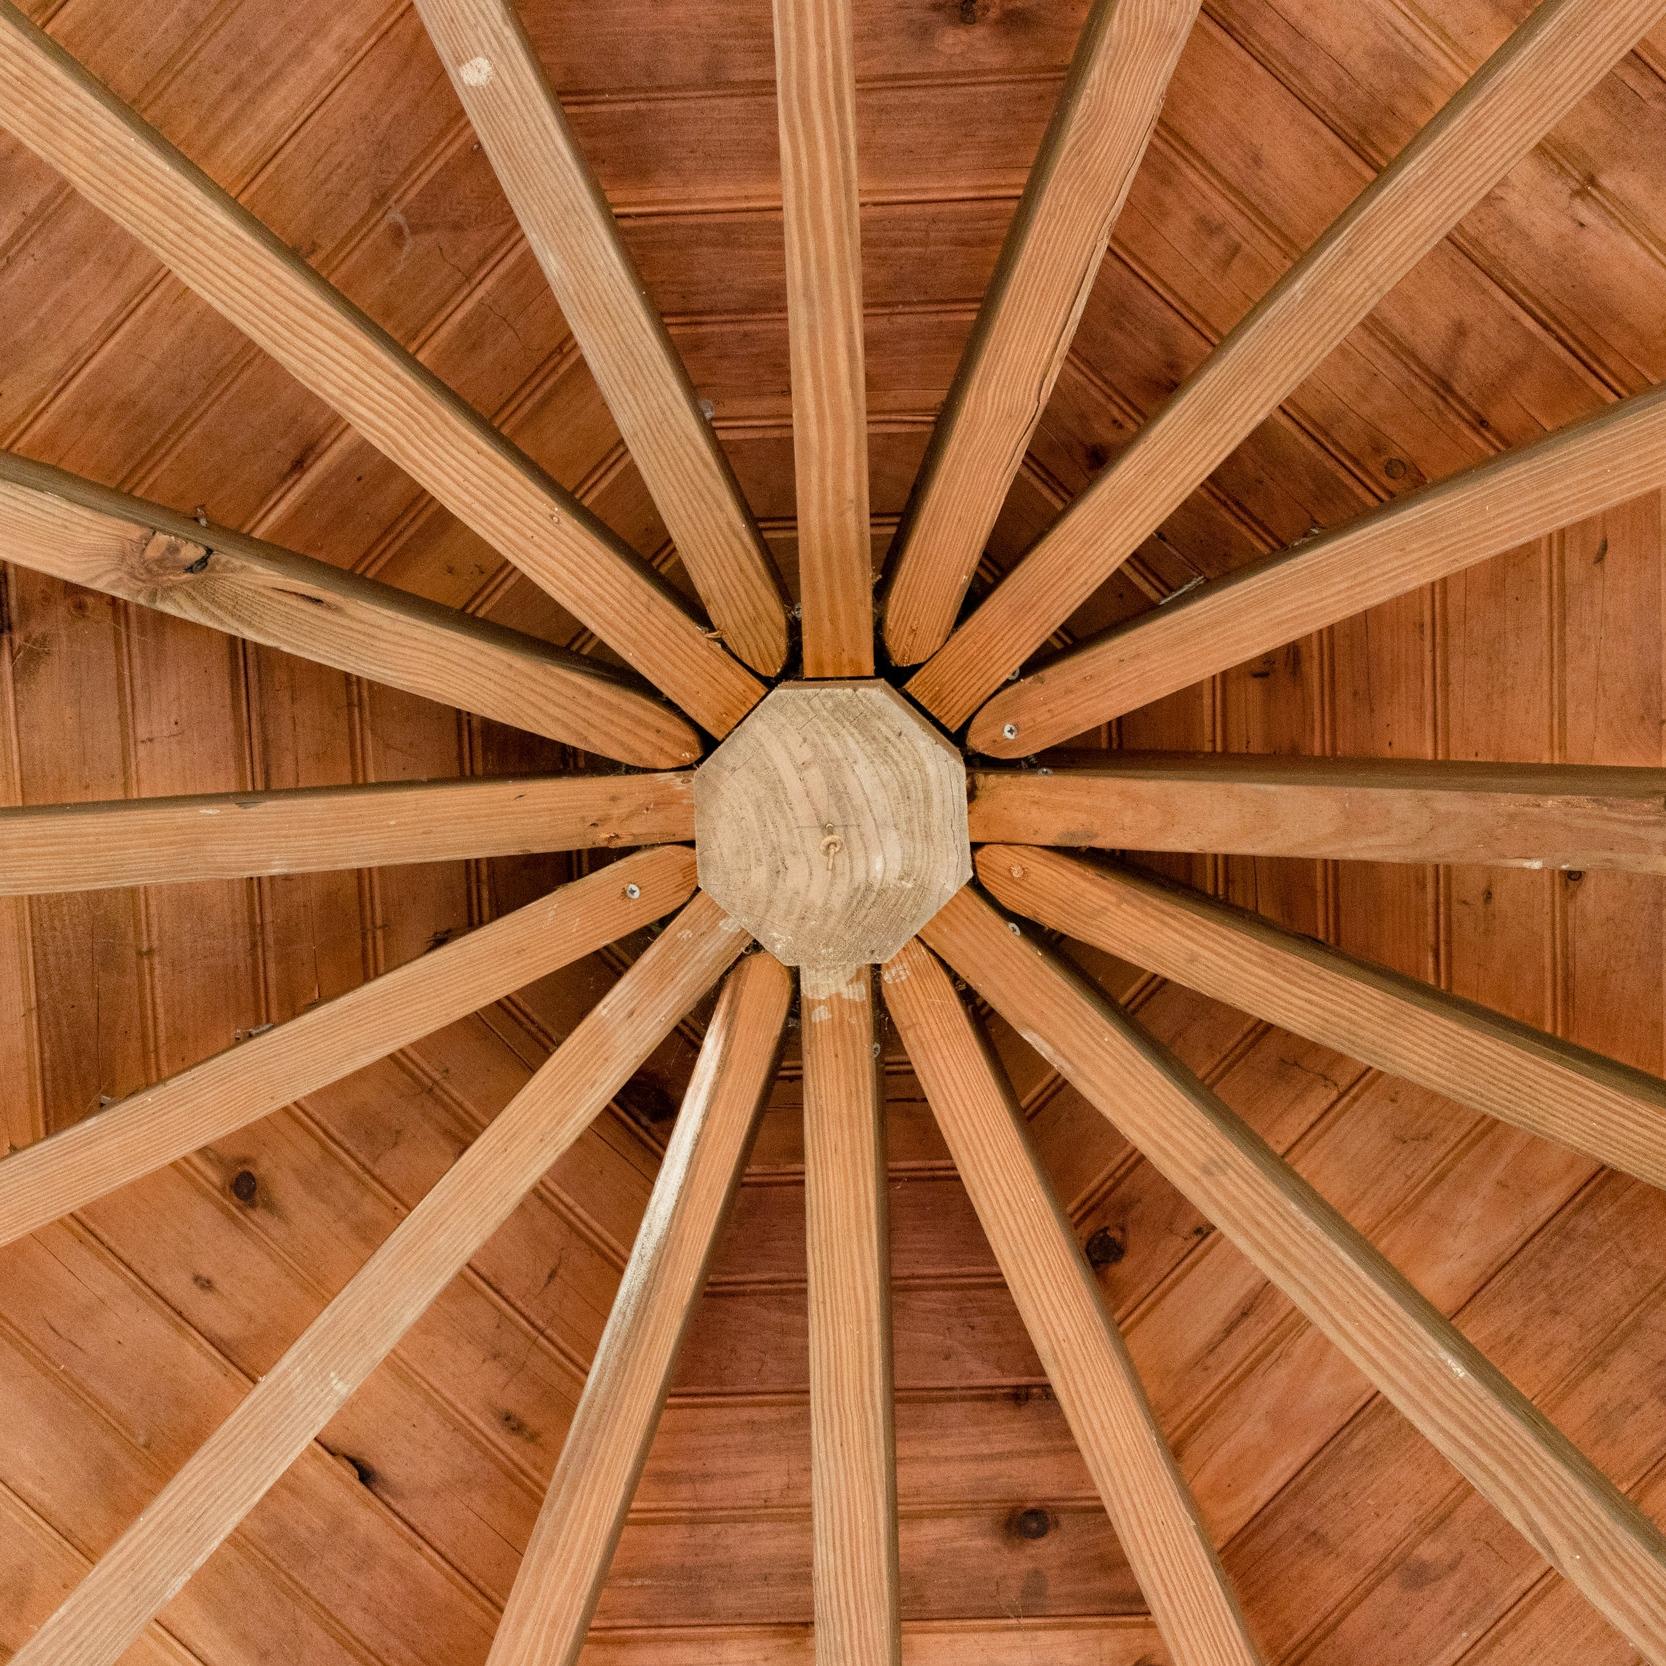 Gazebo roof